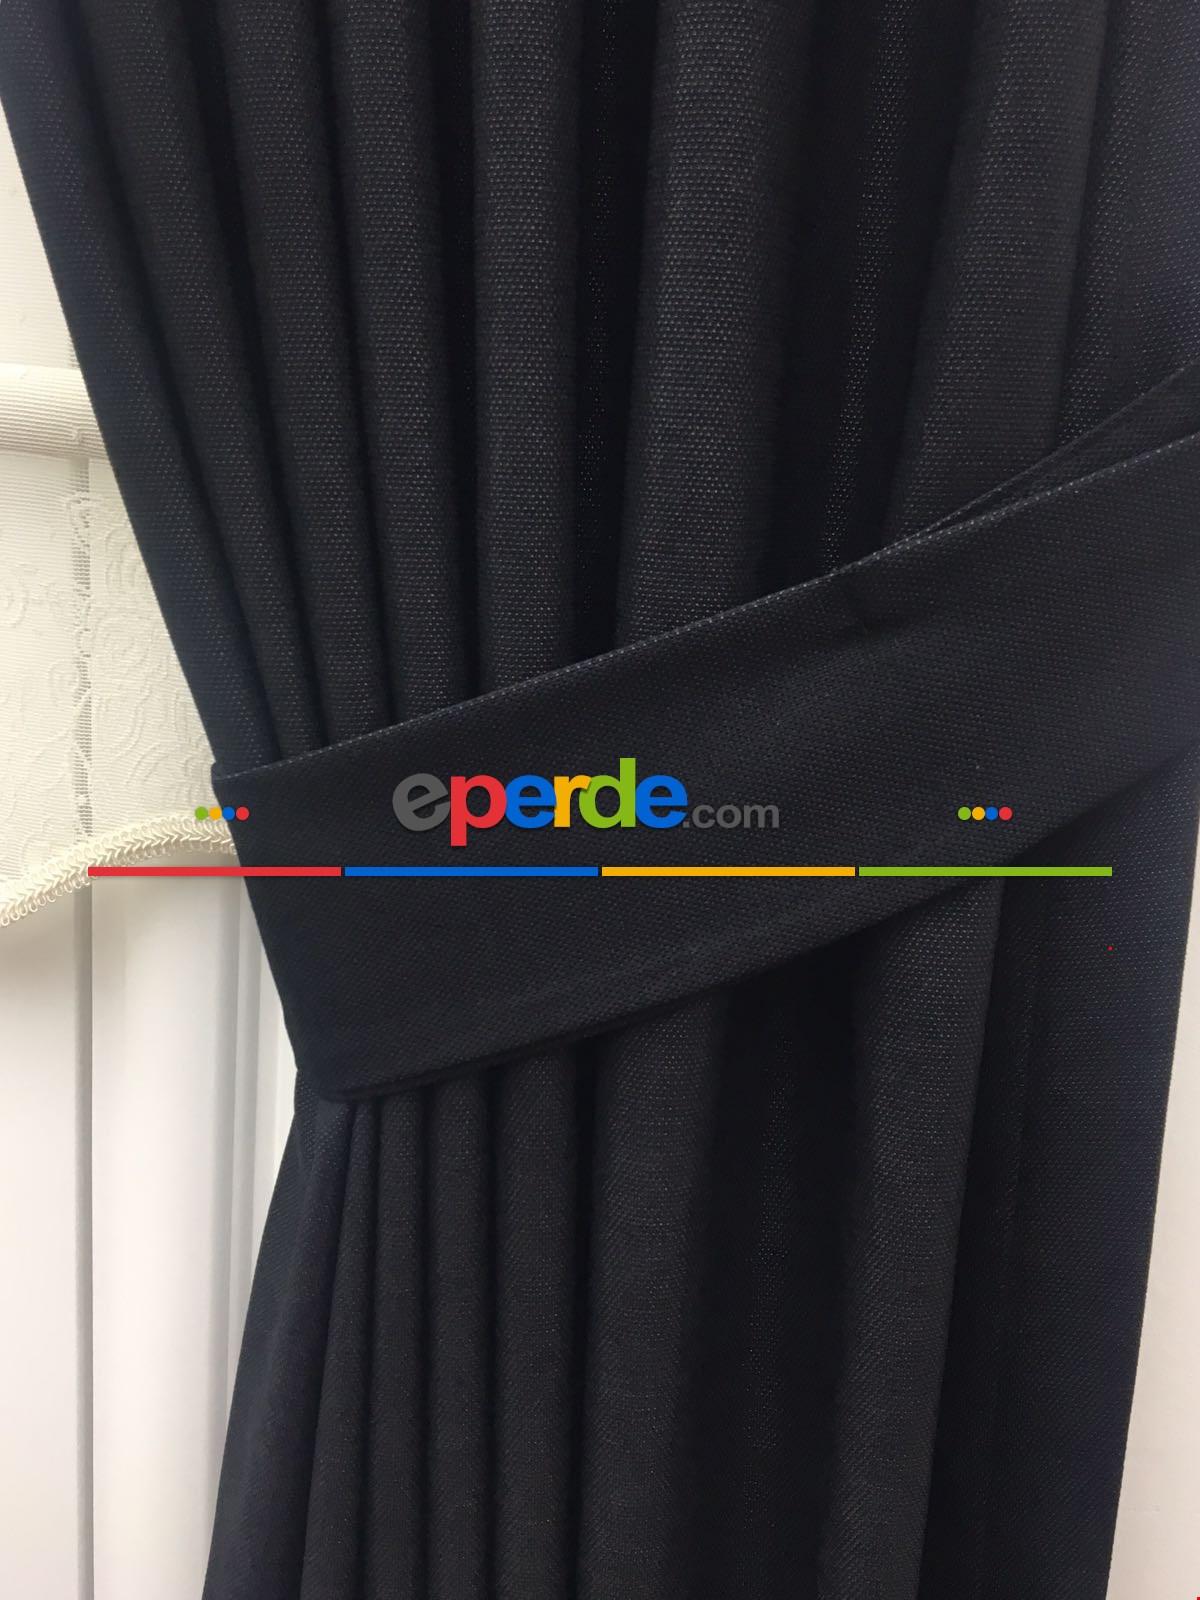 Siyah Renk Düz Fon Perde 140cm X 250cm